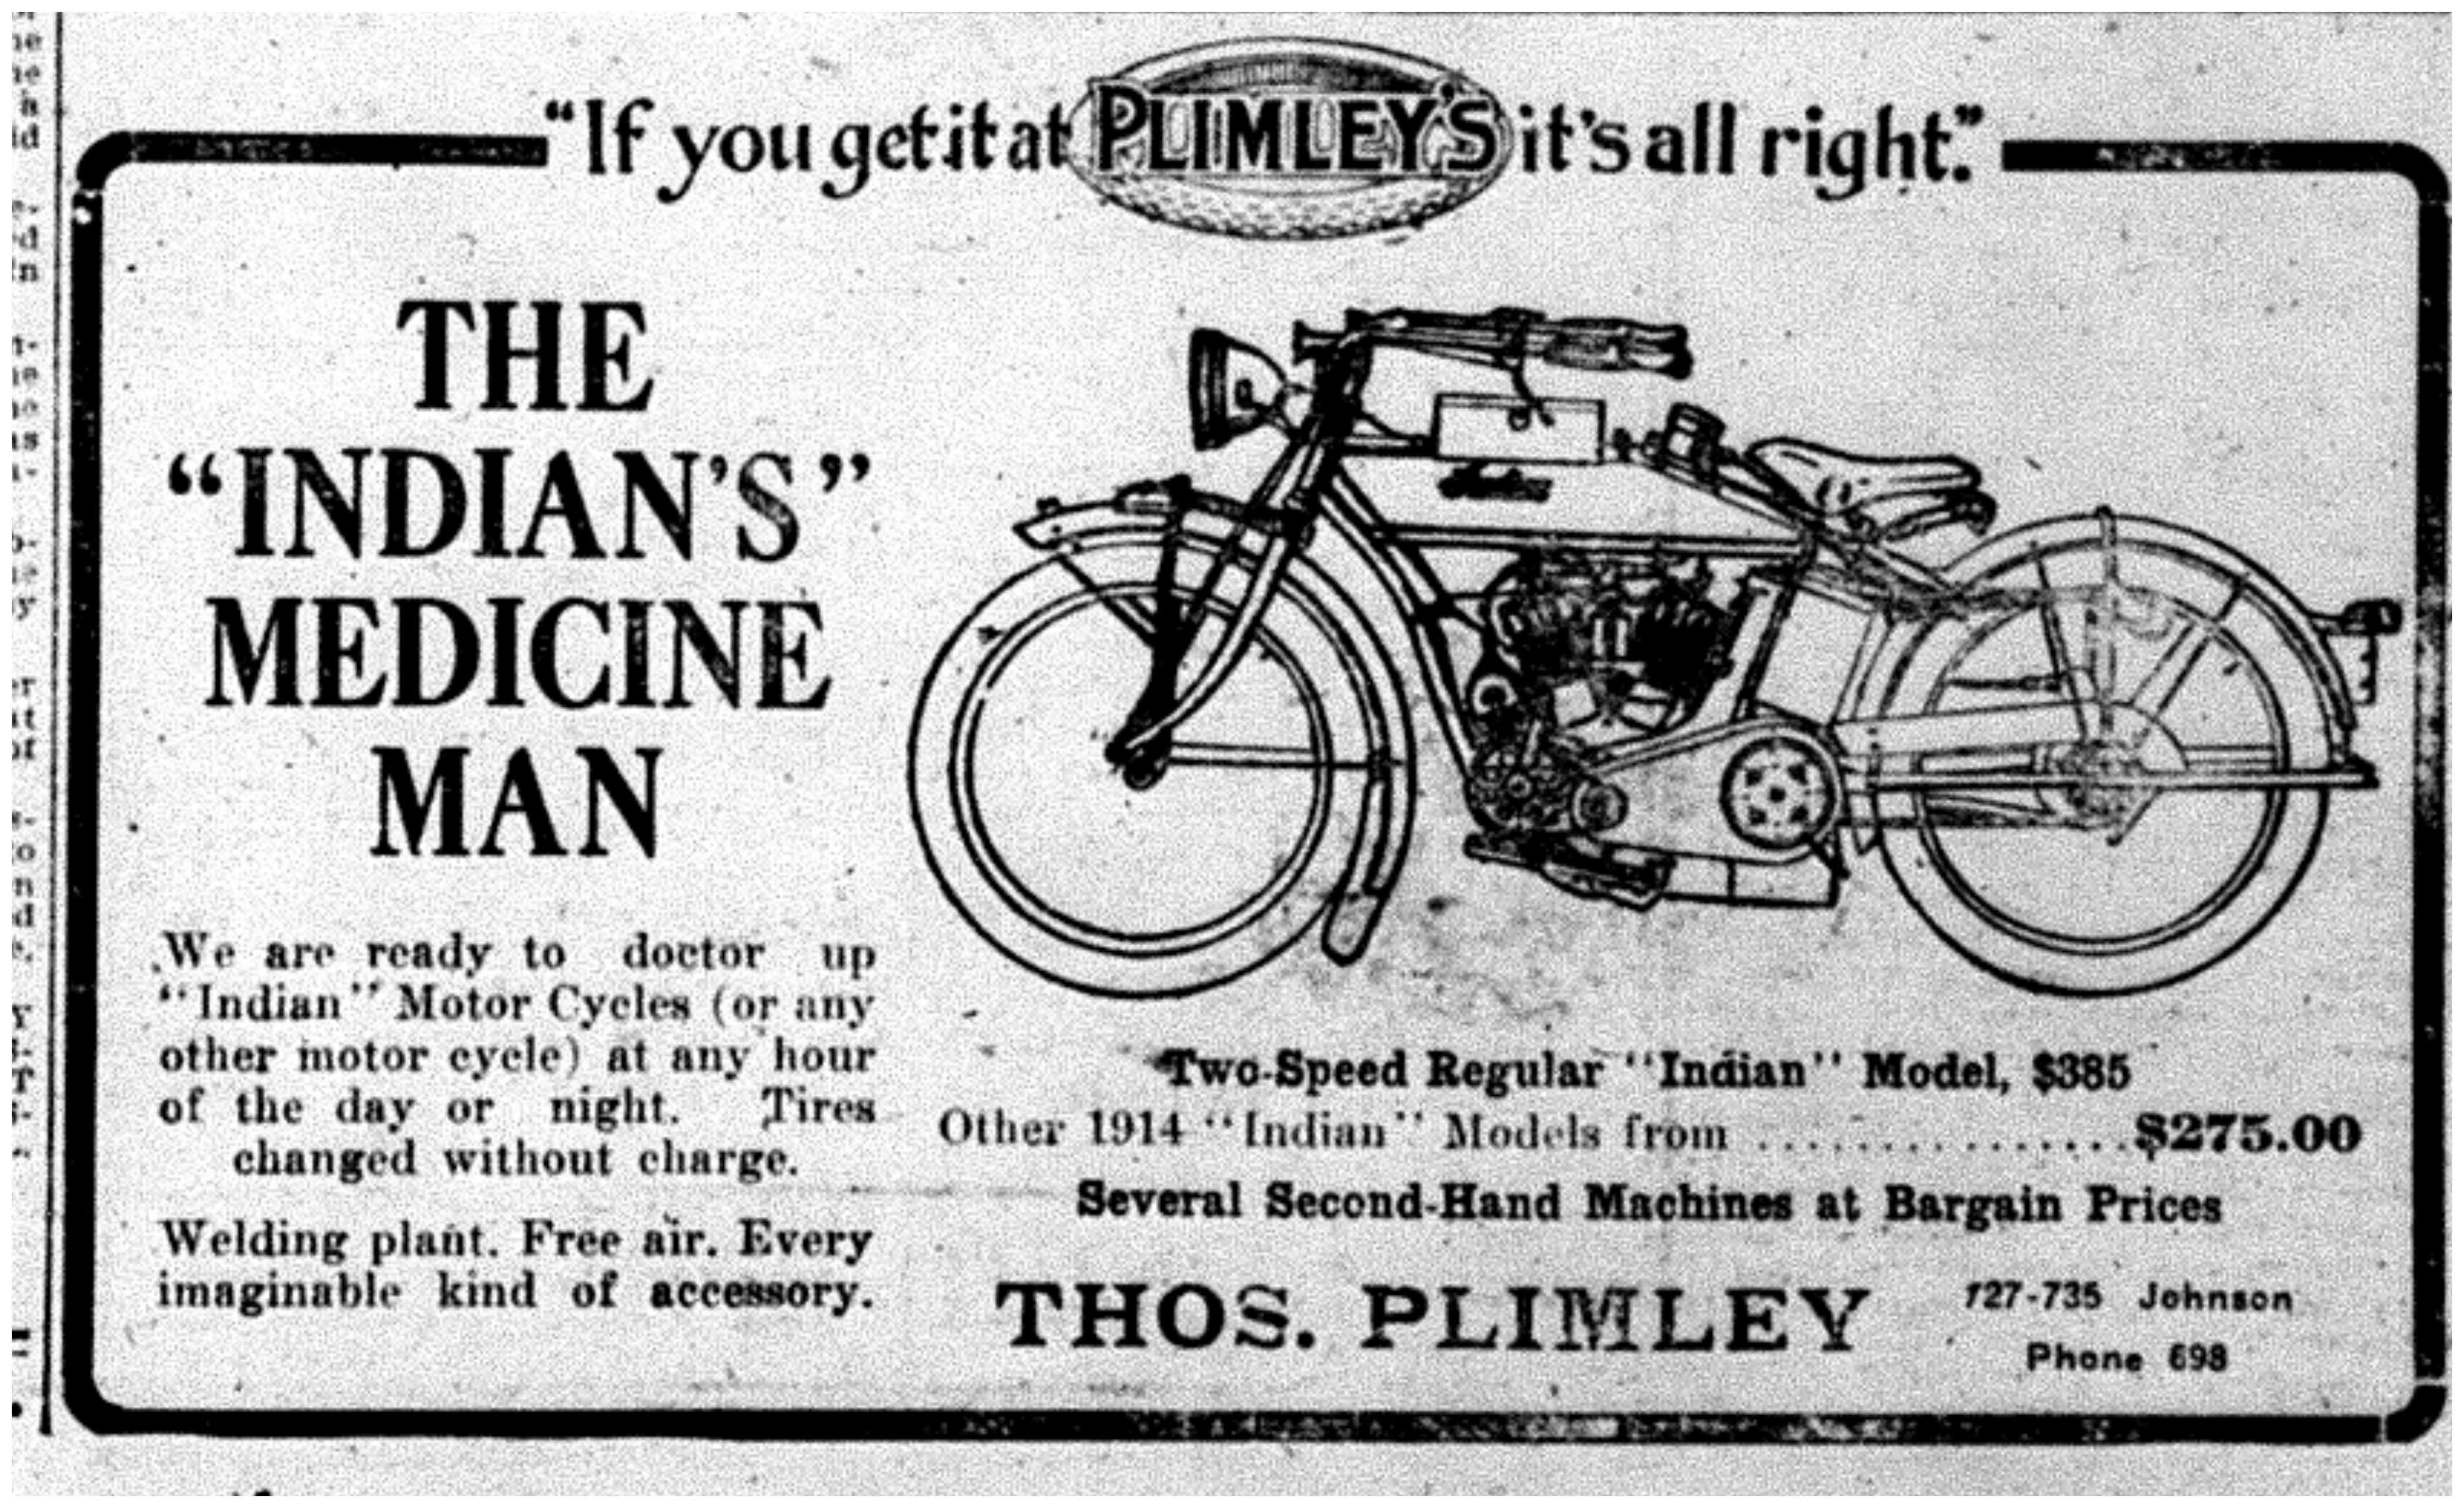 """The ""Indian's"" Medicine Man"""